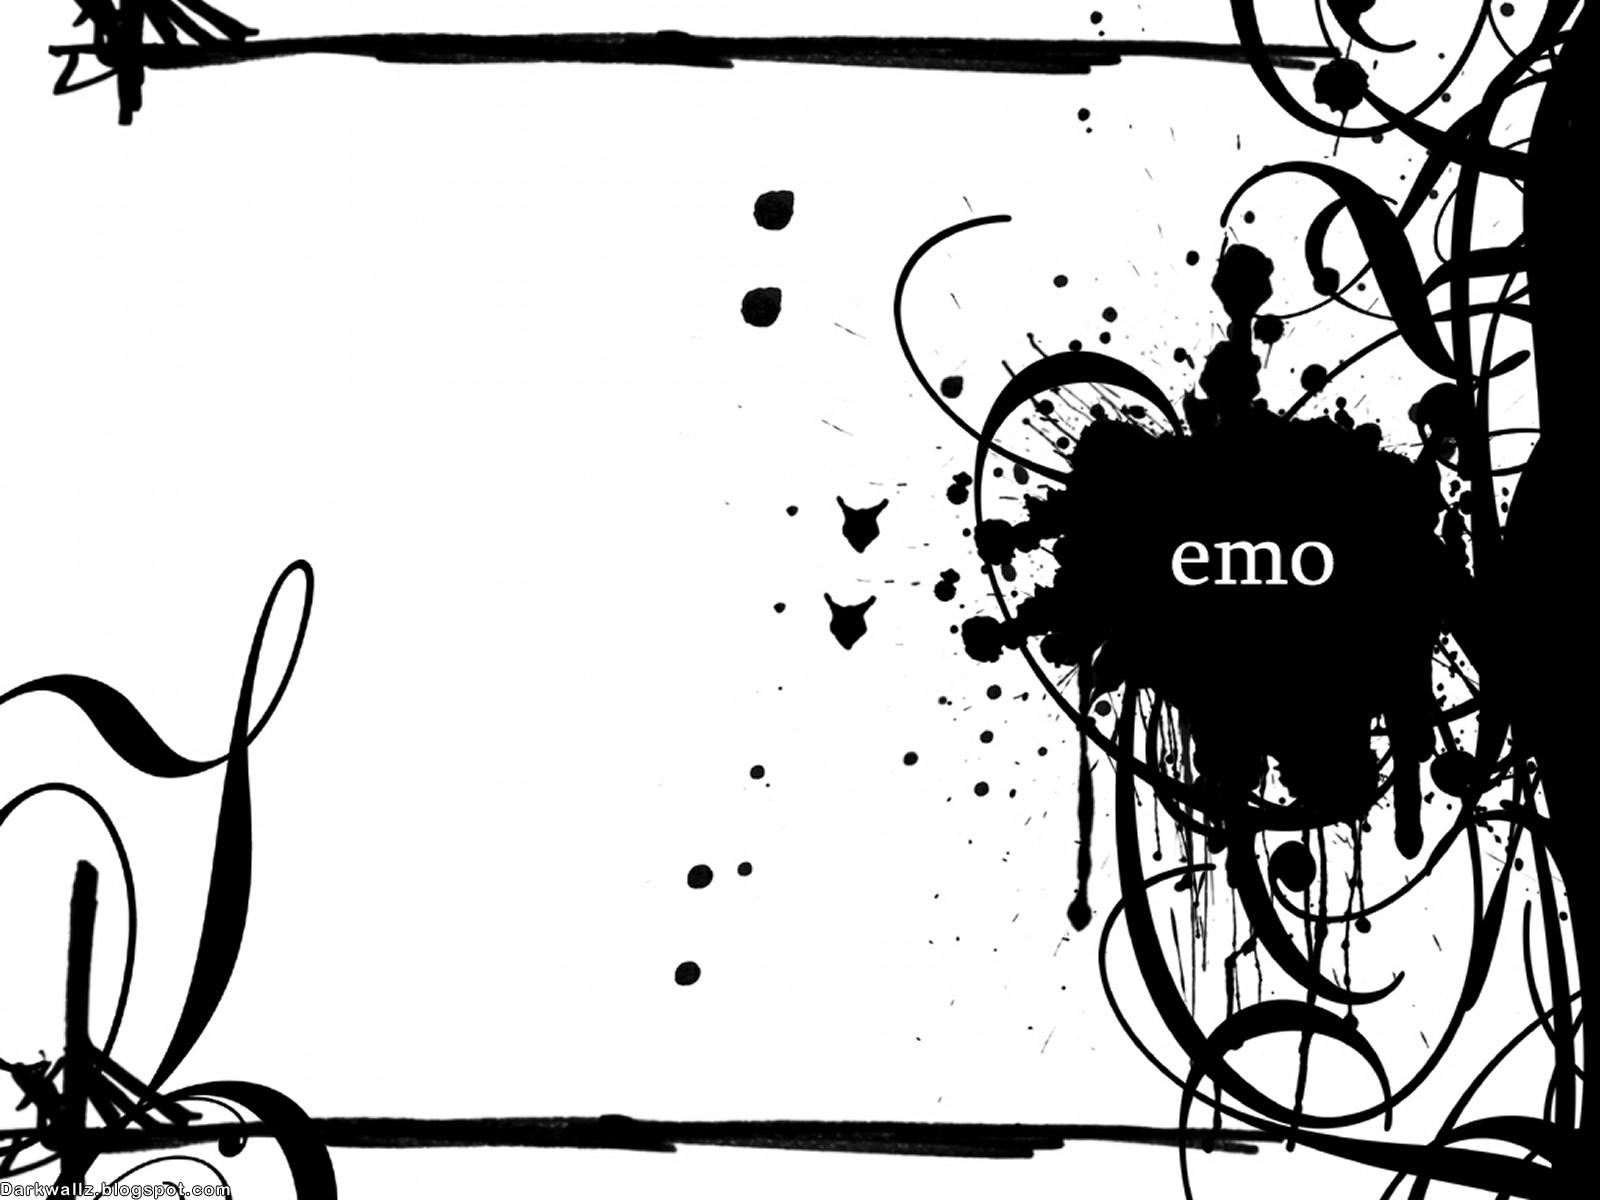 Emo Wallpapers 09| Dark Wallpaper Download